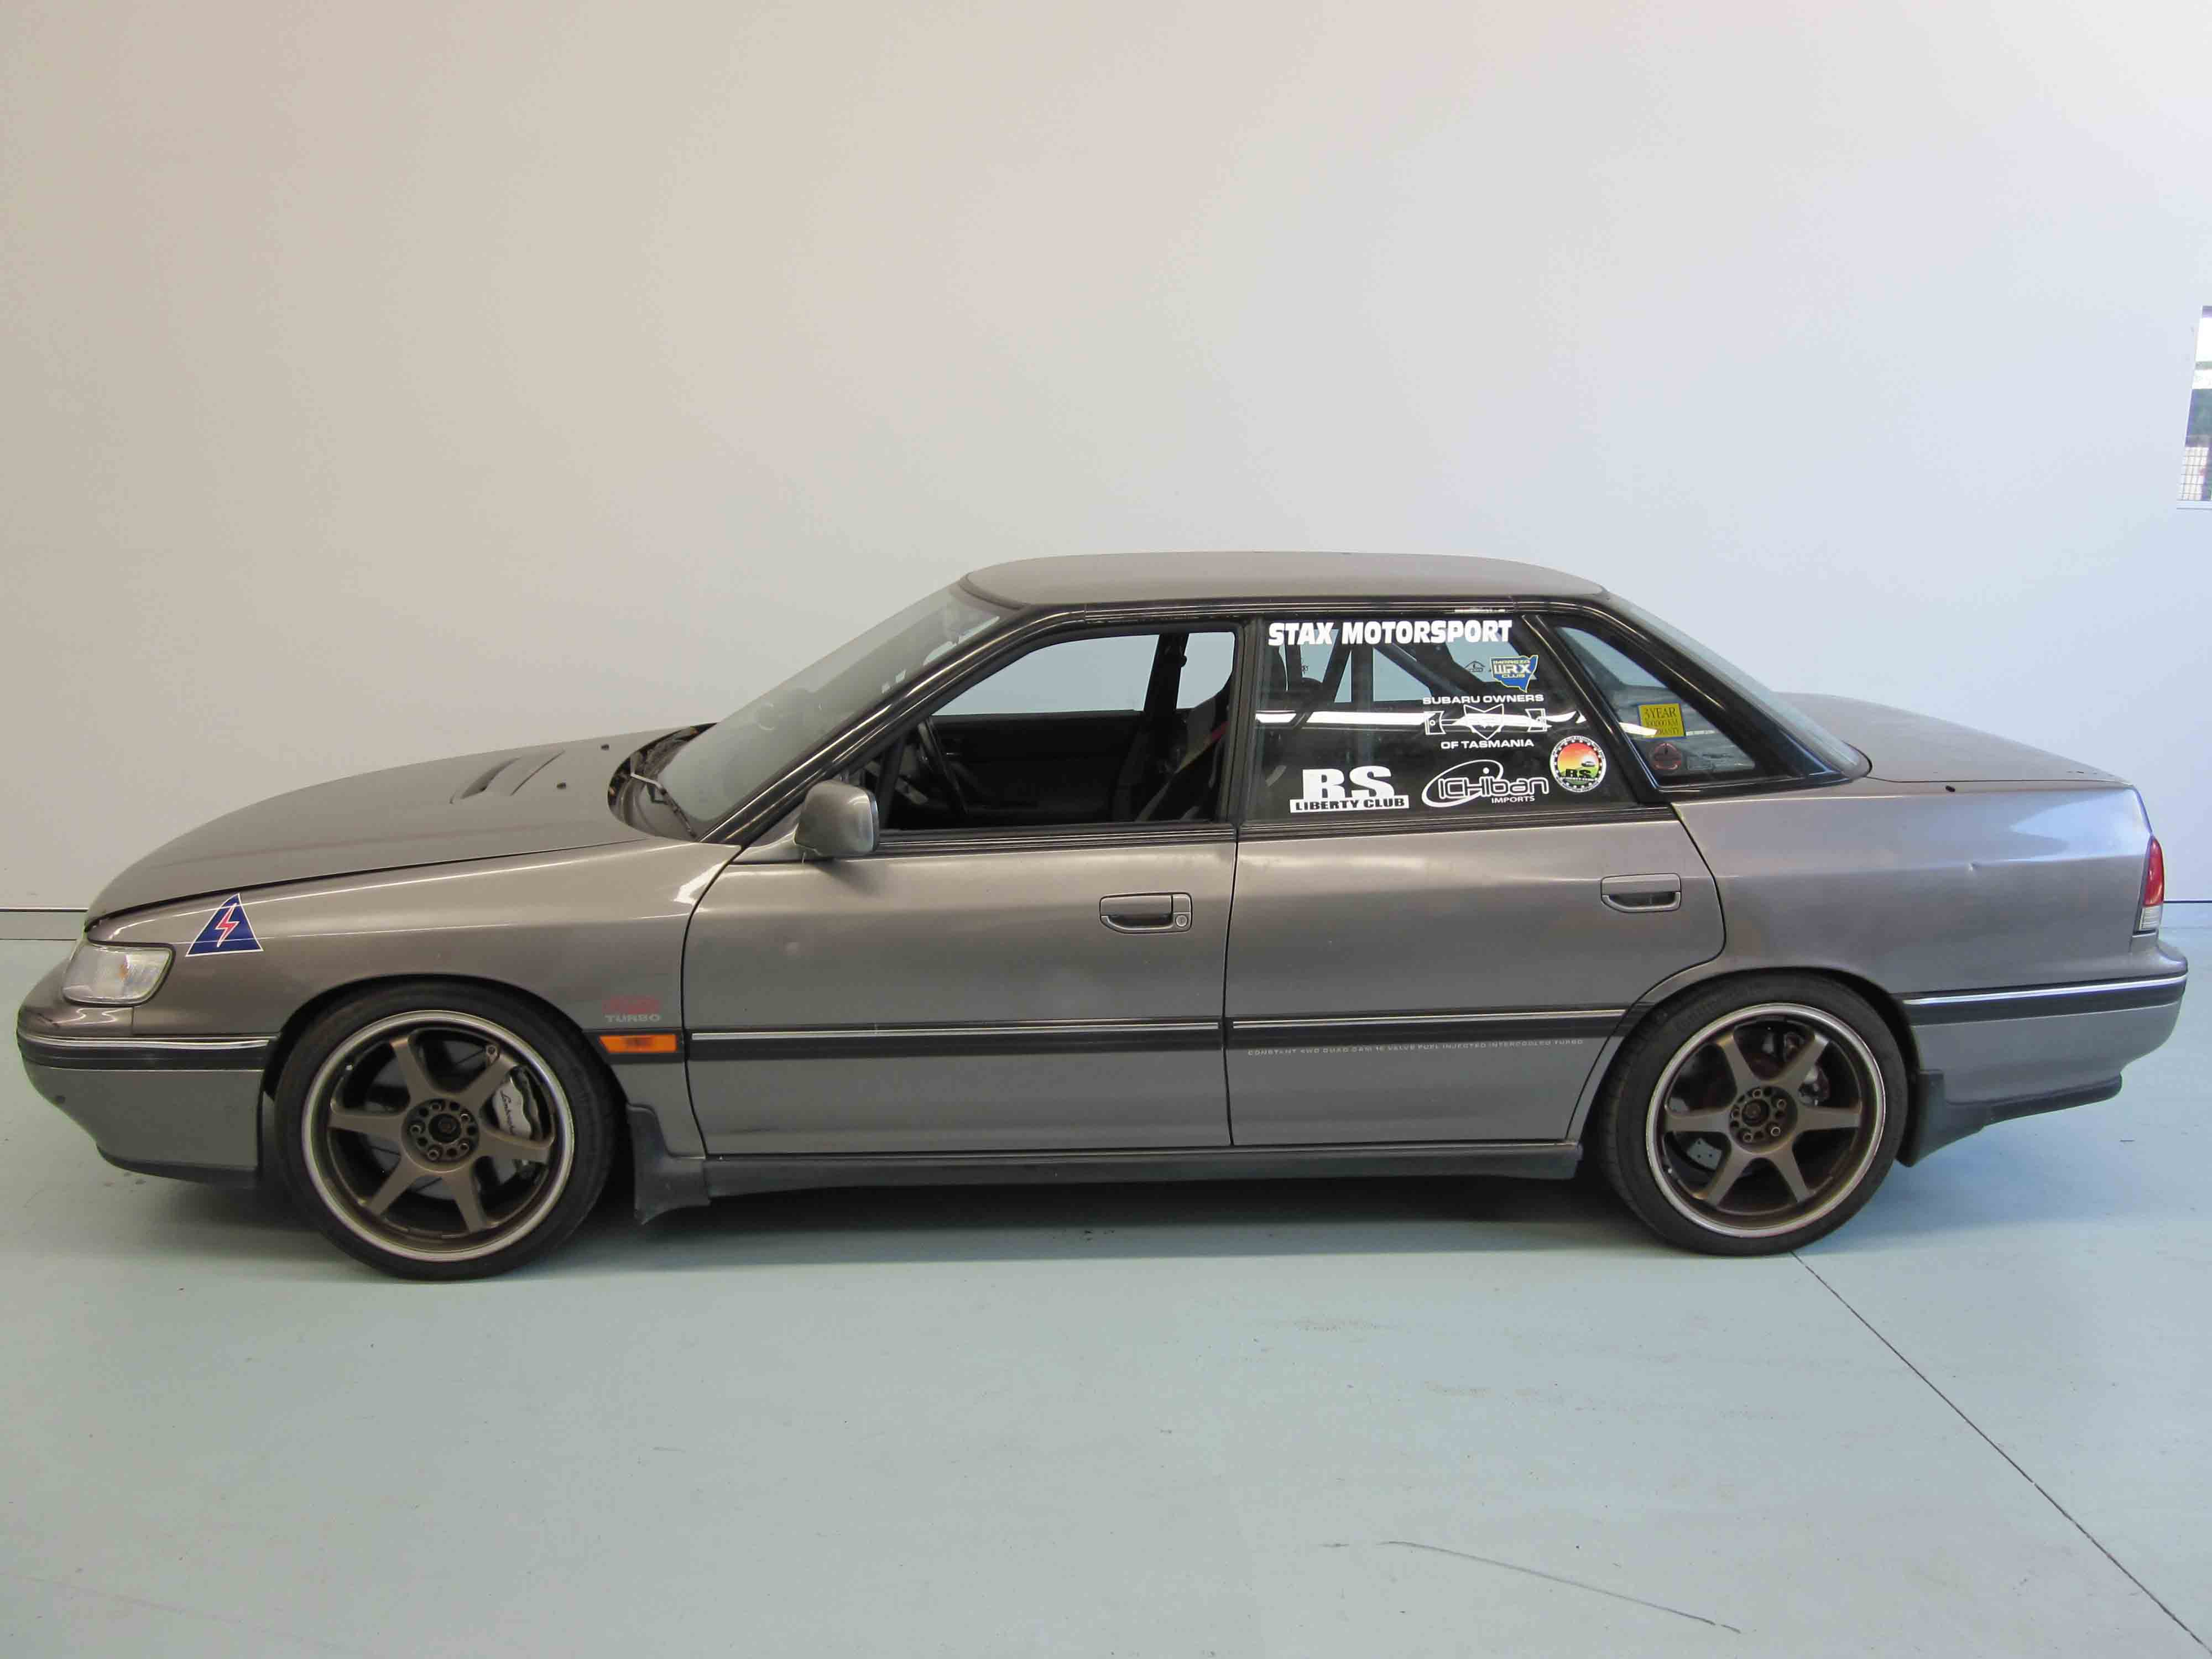 Liberty RS Turbo (1991-1994)